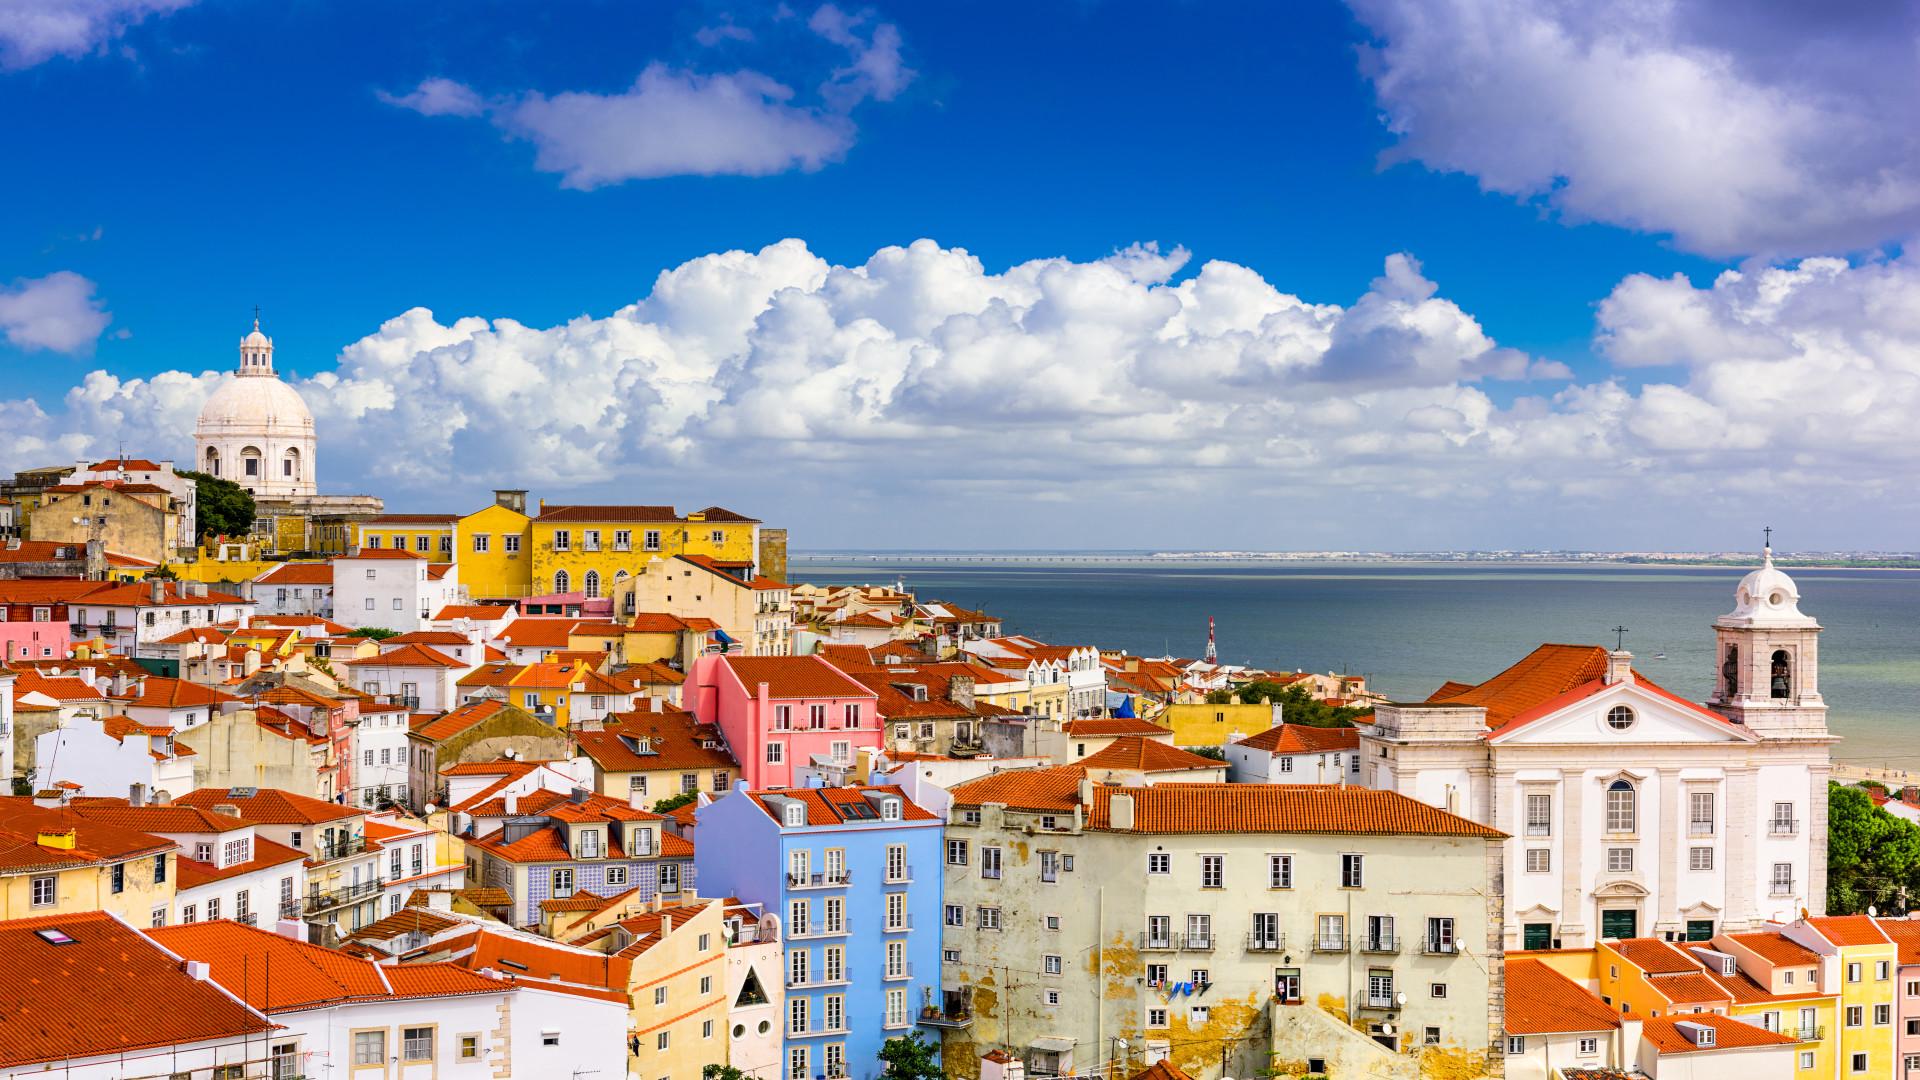 Kleurrijk stadsgezicht Alfama, Lissabon, Portugal